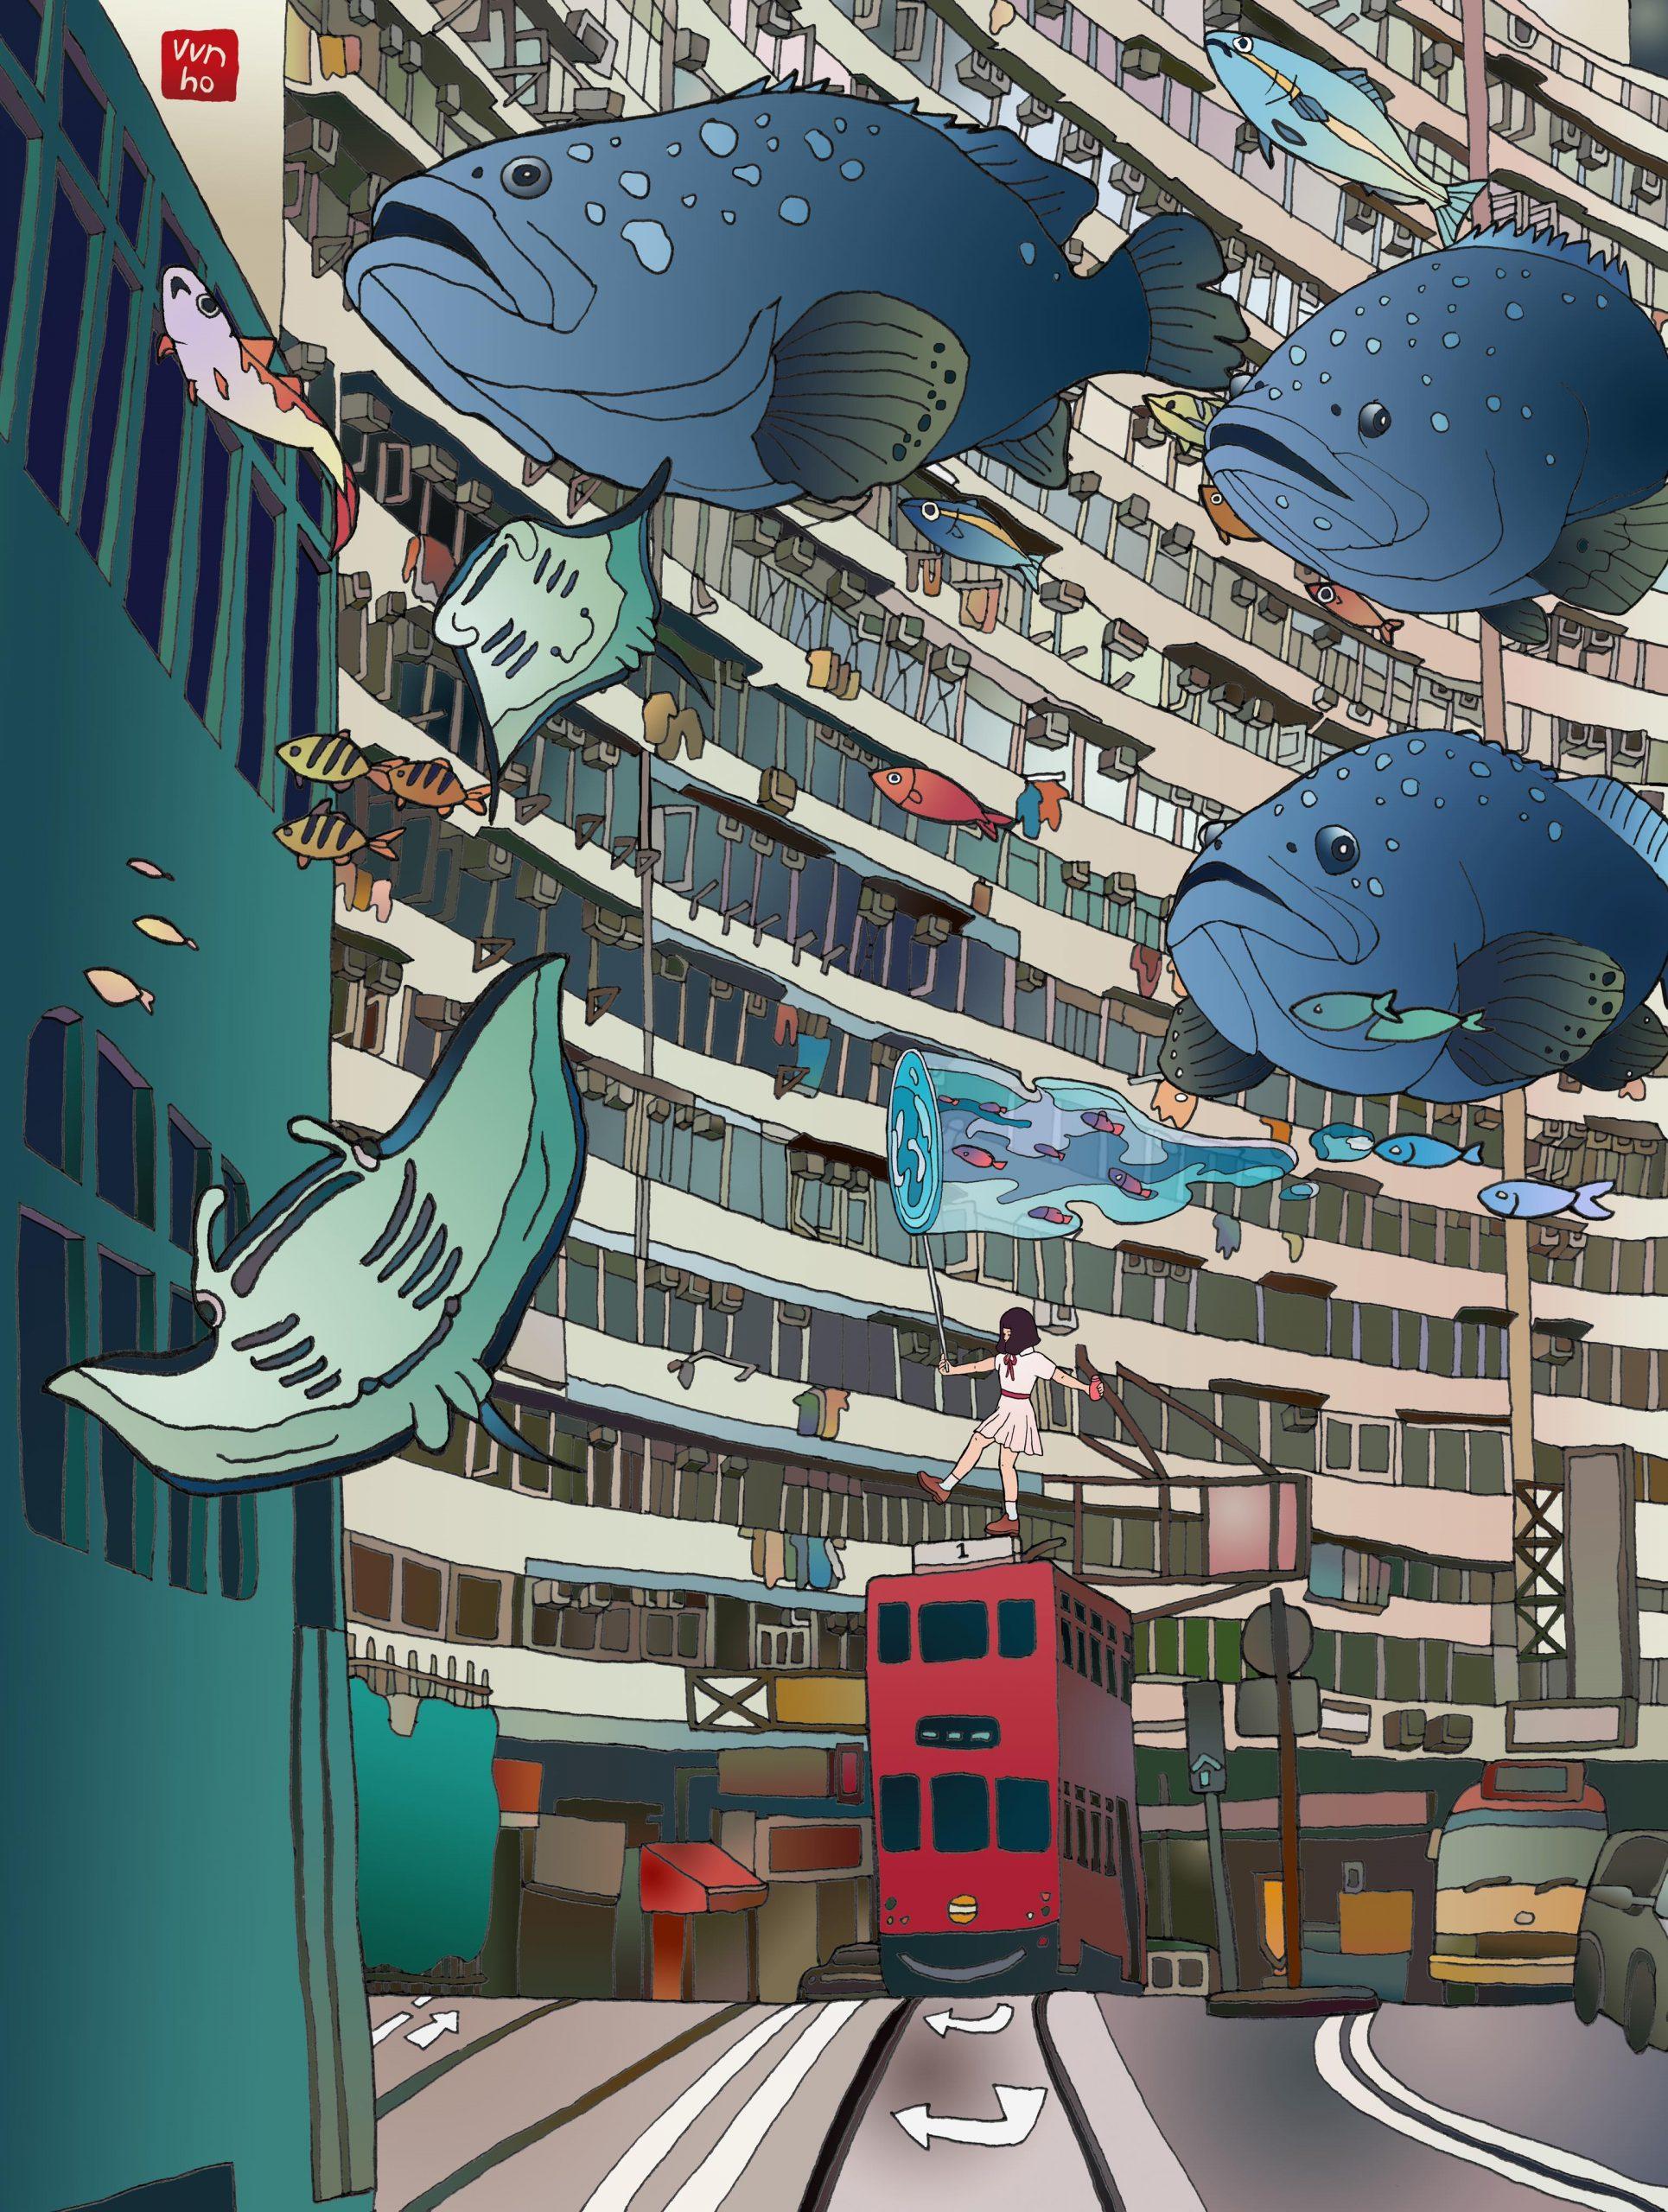 Vivian Ho, 香港插畫師, Wish you were here, 世界紛紛擾擾喧喧鬧鬧 什麼是真實,五月天, 最重要的小事, 英皇道, 電車, 怪獸大廈